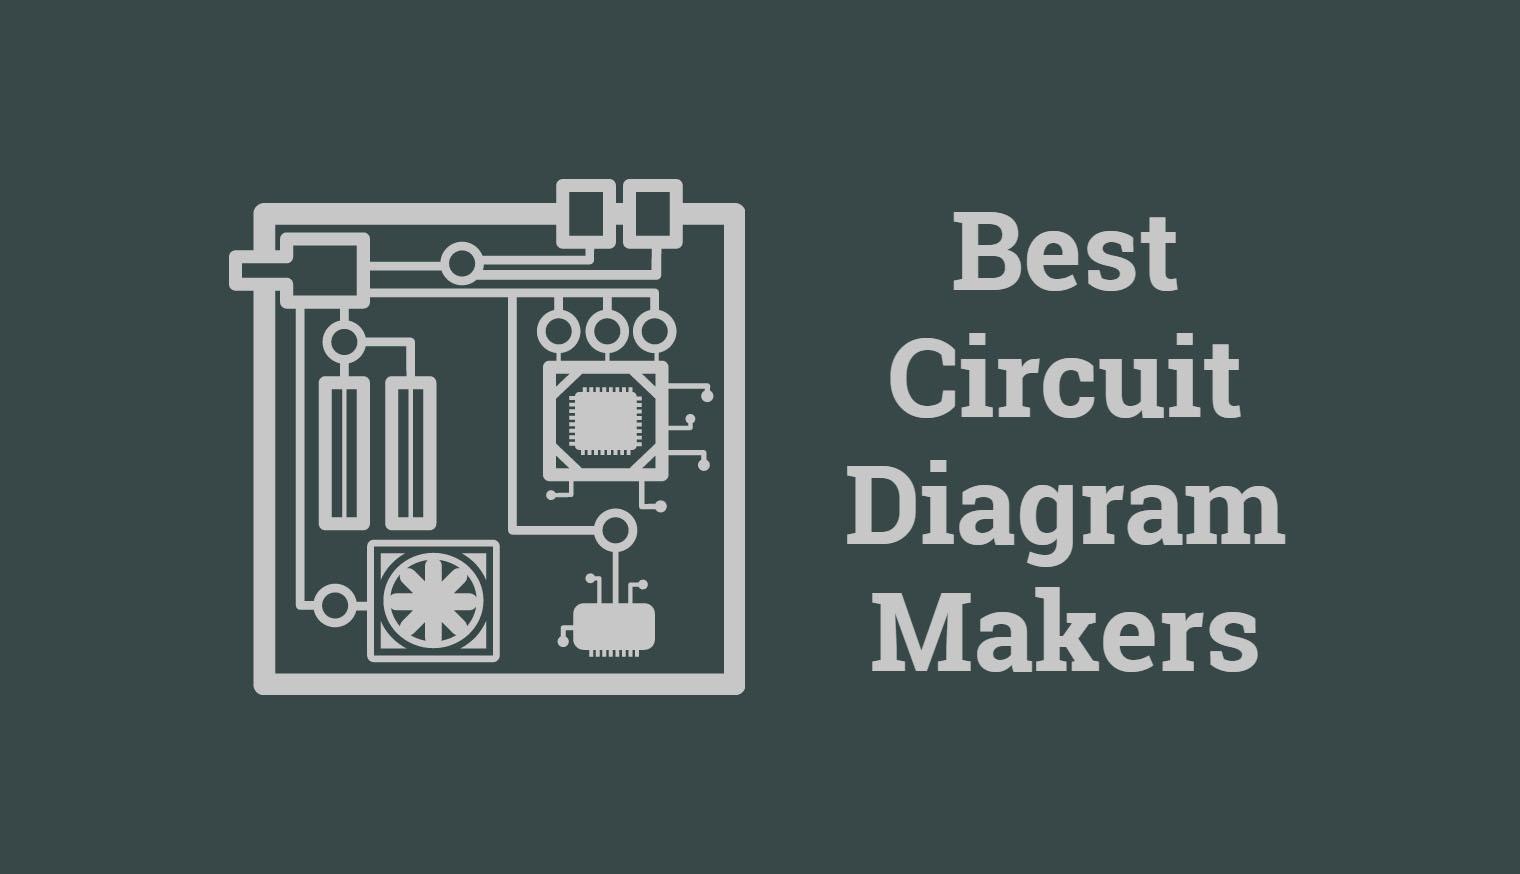 Top 5 Best Circuit Diagram Makers 2020 - My Chart Guide [ 874 x 1520 Pixel ]